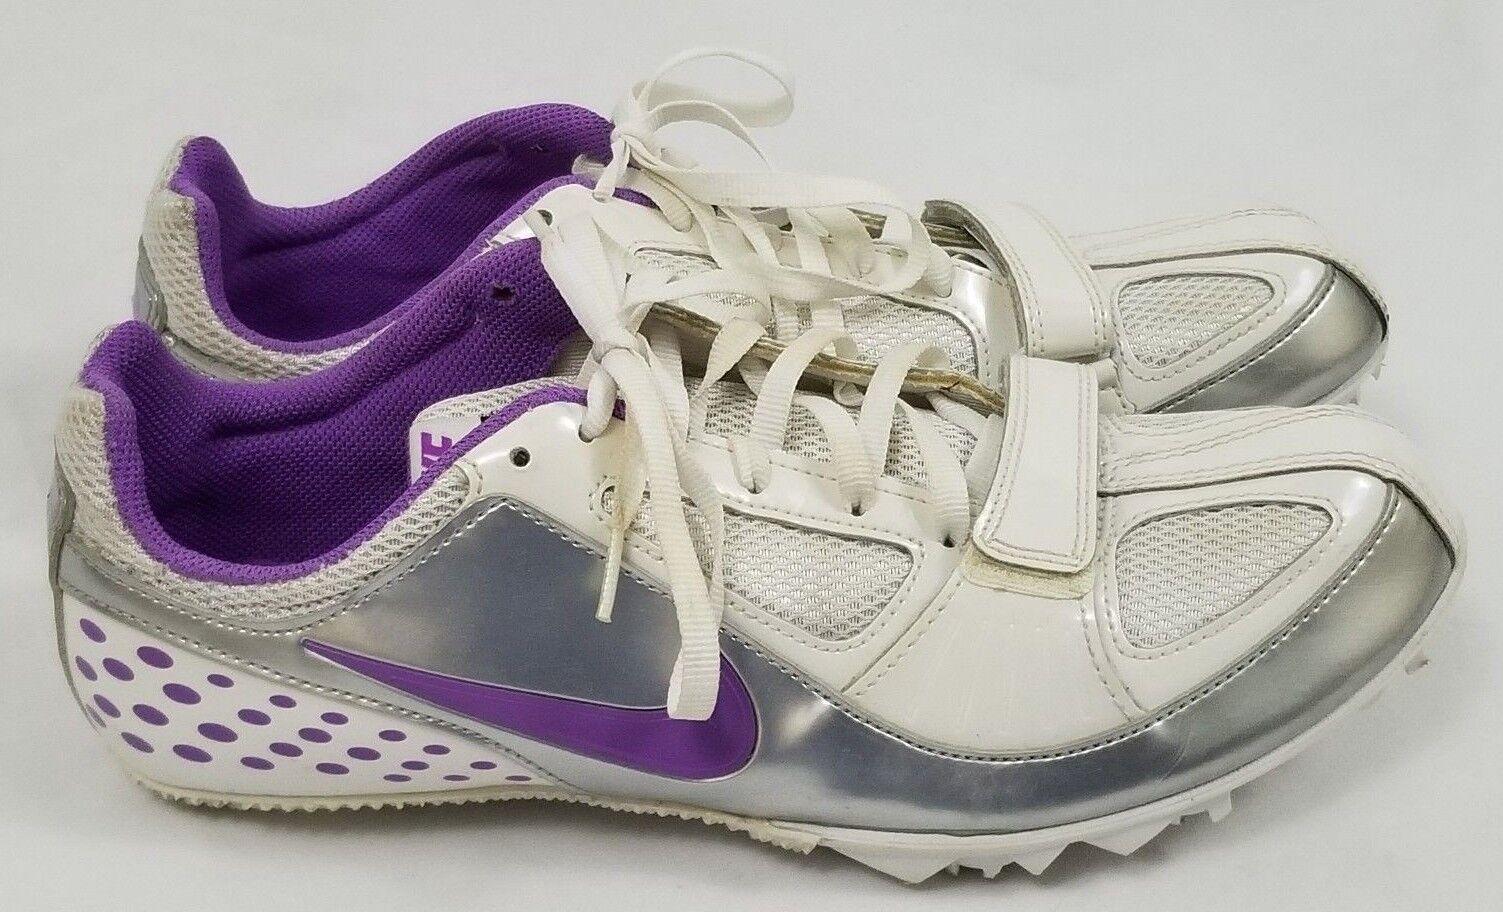 aafe763ea7 nike donne l 'ingrandimento rivale scarpe scarpe scarpe da ...